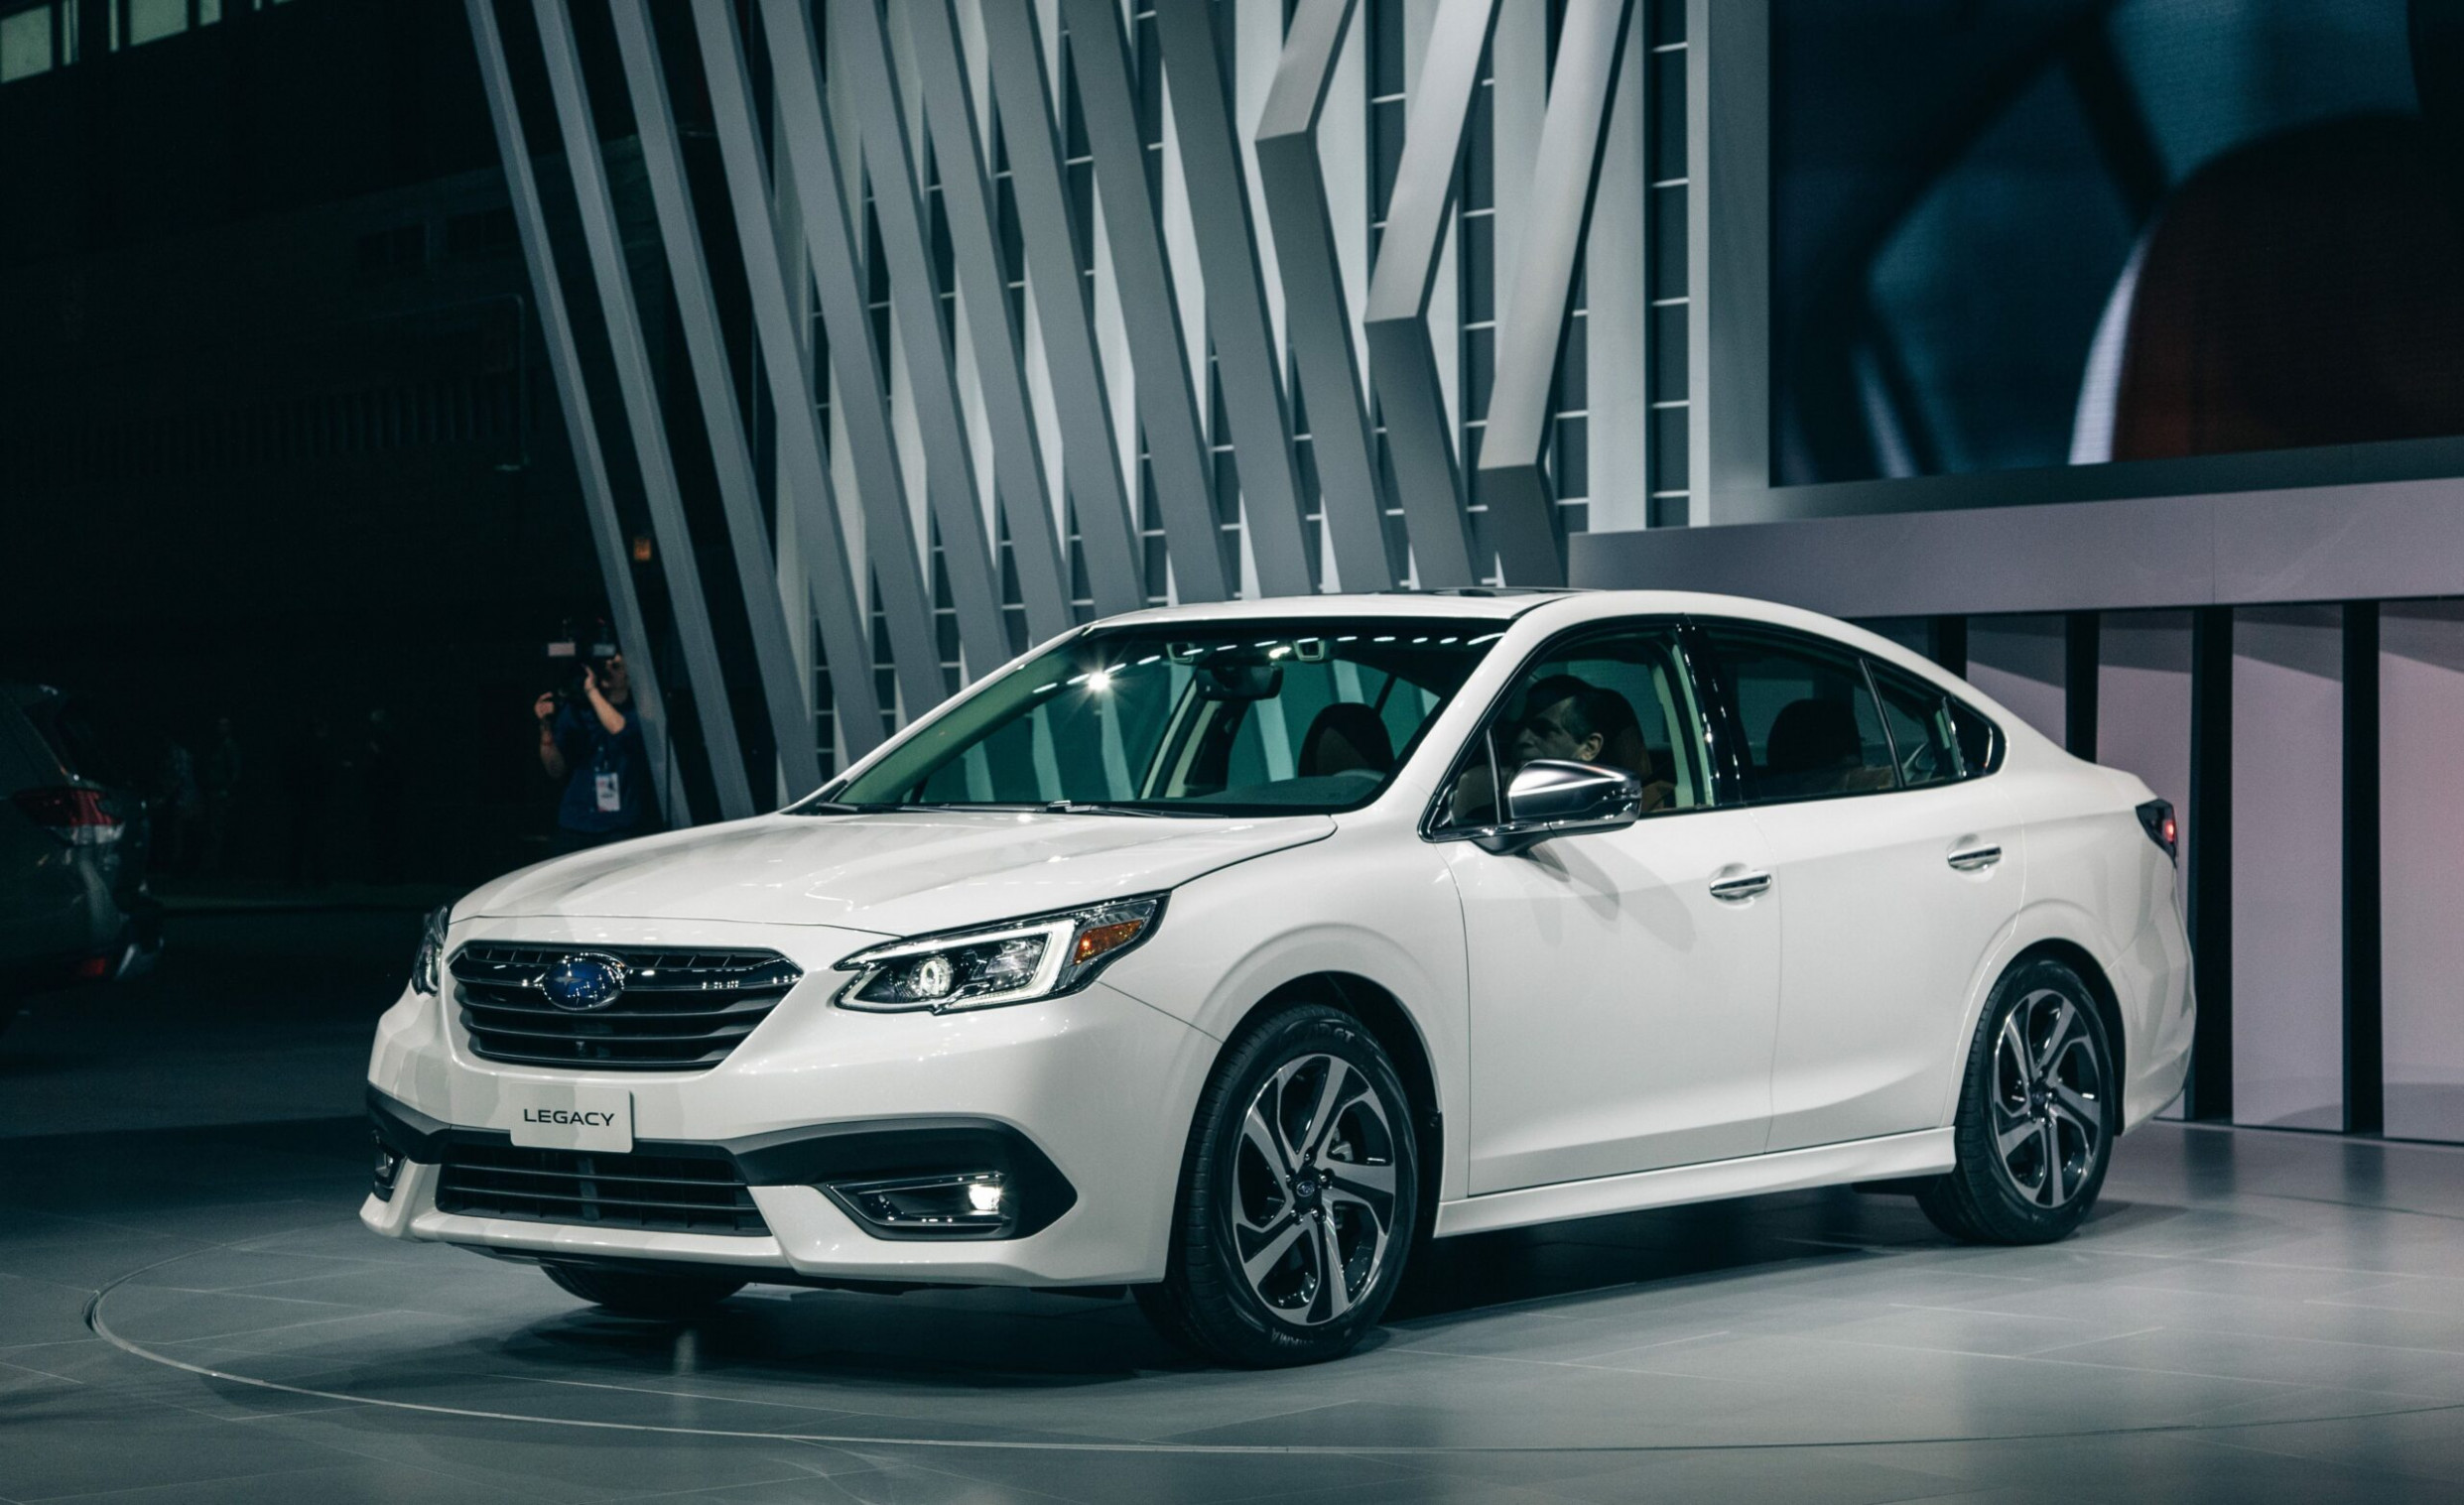 New Concept Subaru New Legacy 2022